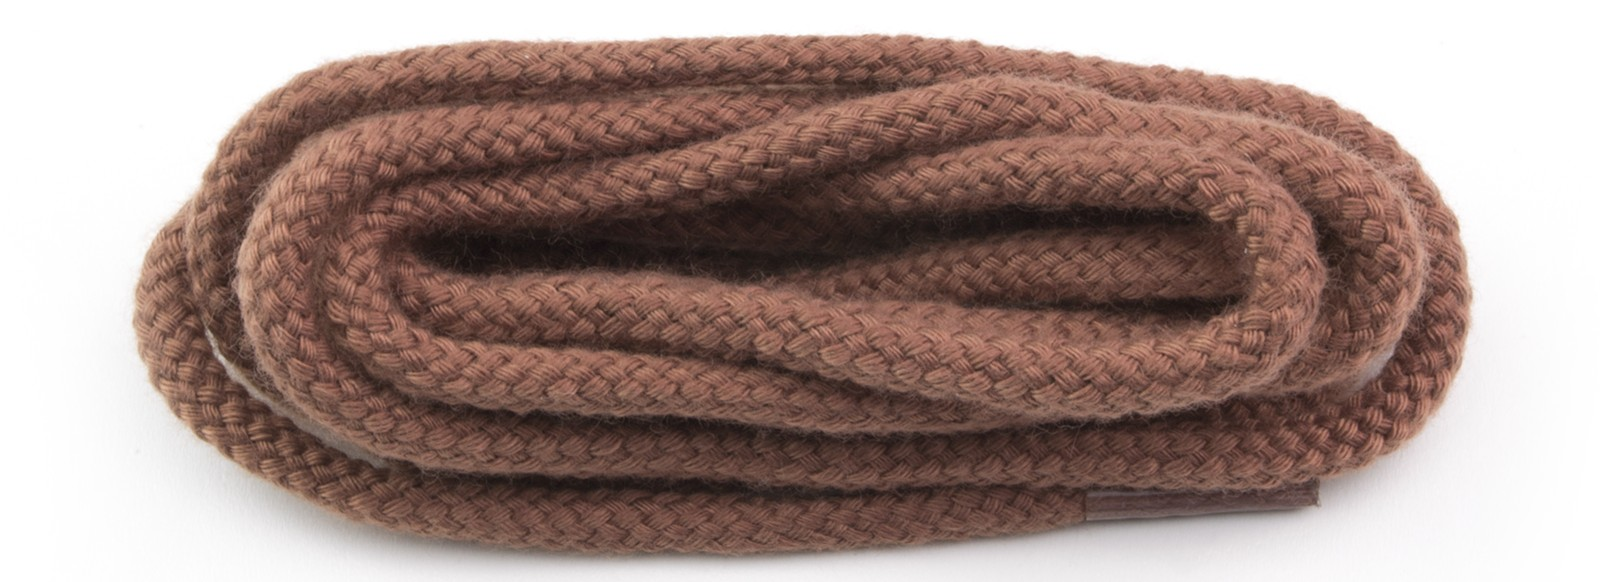 Tan Cord Round Laces